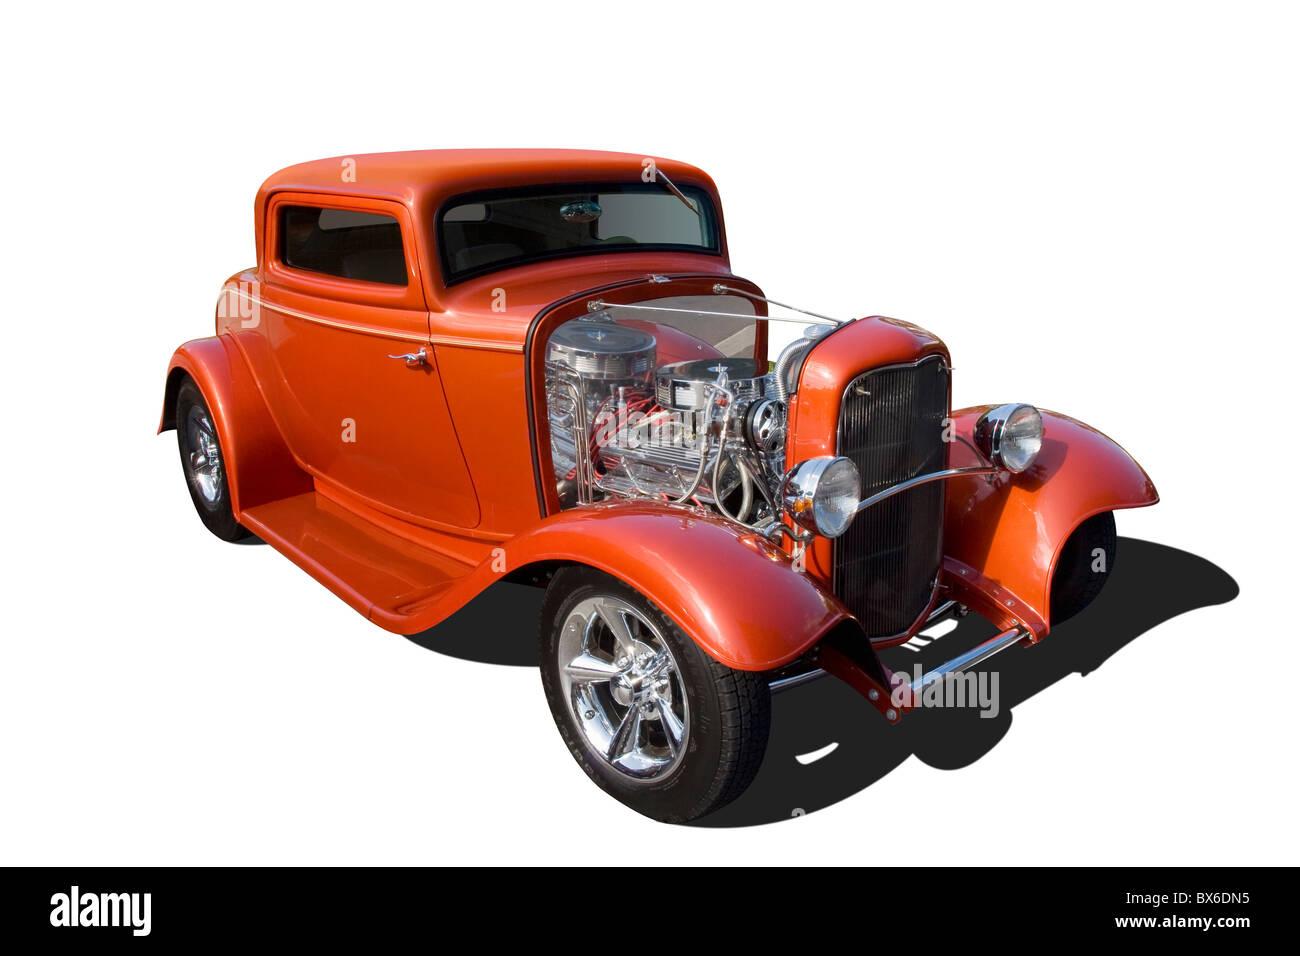 Auto- 1932 Ford Hot Rod. Red. Springfield, Ohio, USA Stock Photo ...